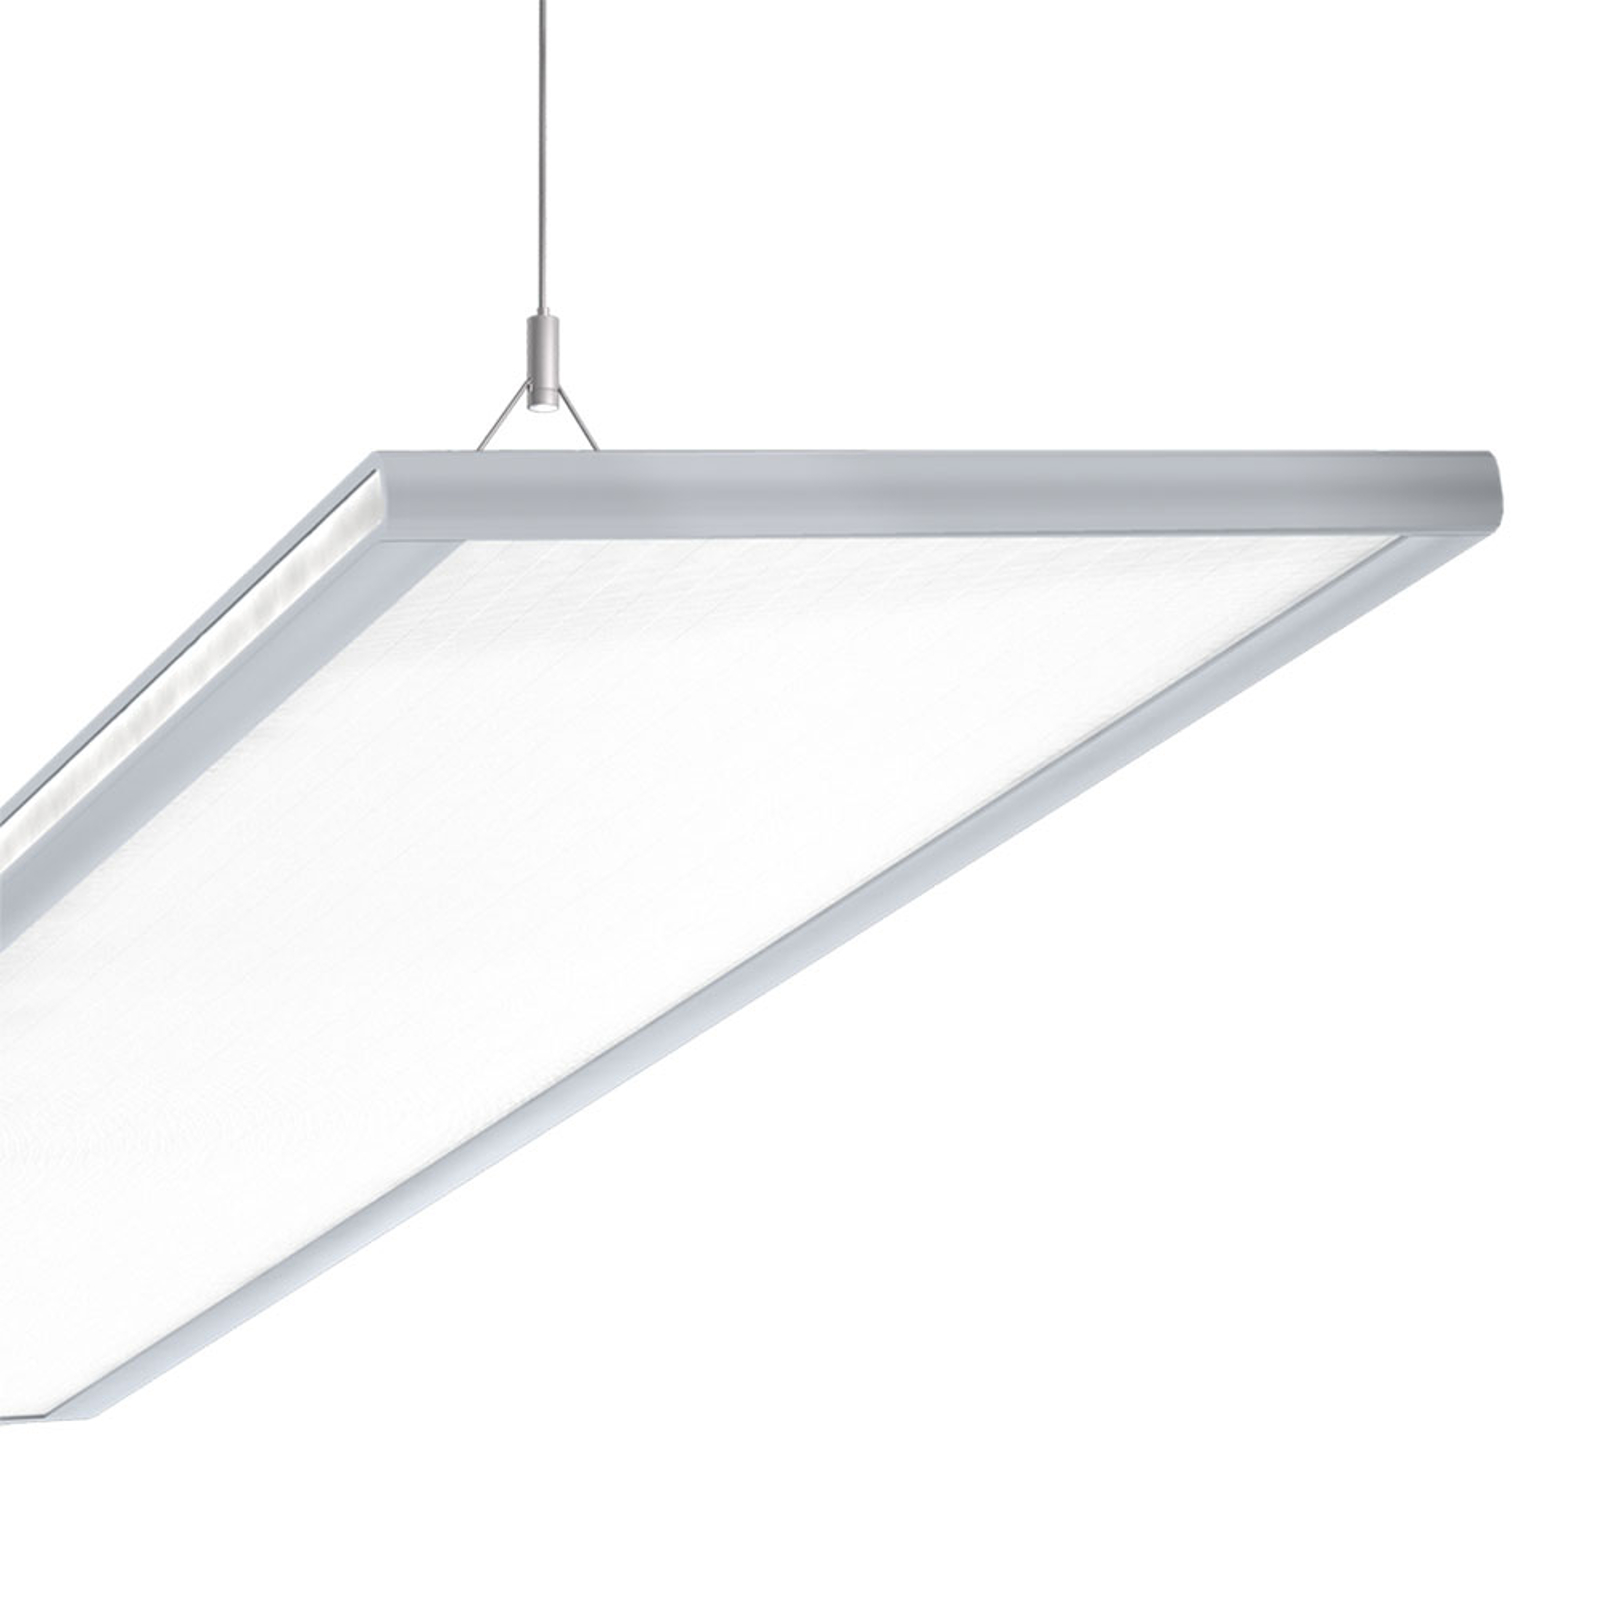 LED-Hängeleuchte alvia 139cm 9.205lm 4.000K DALI